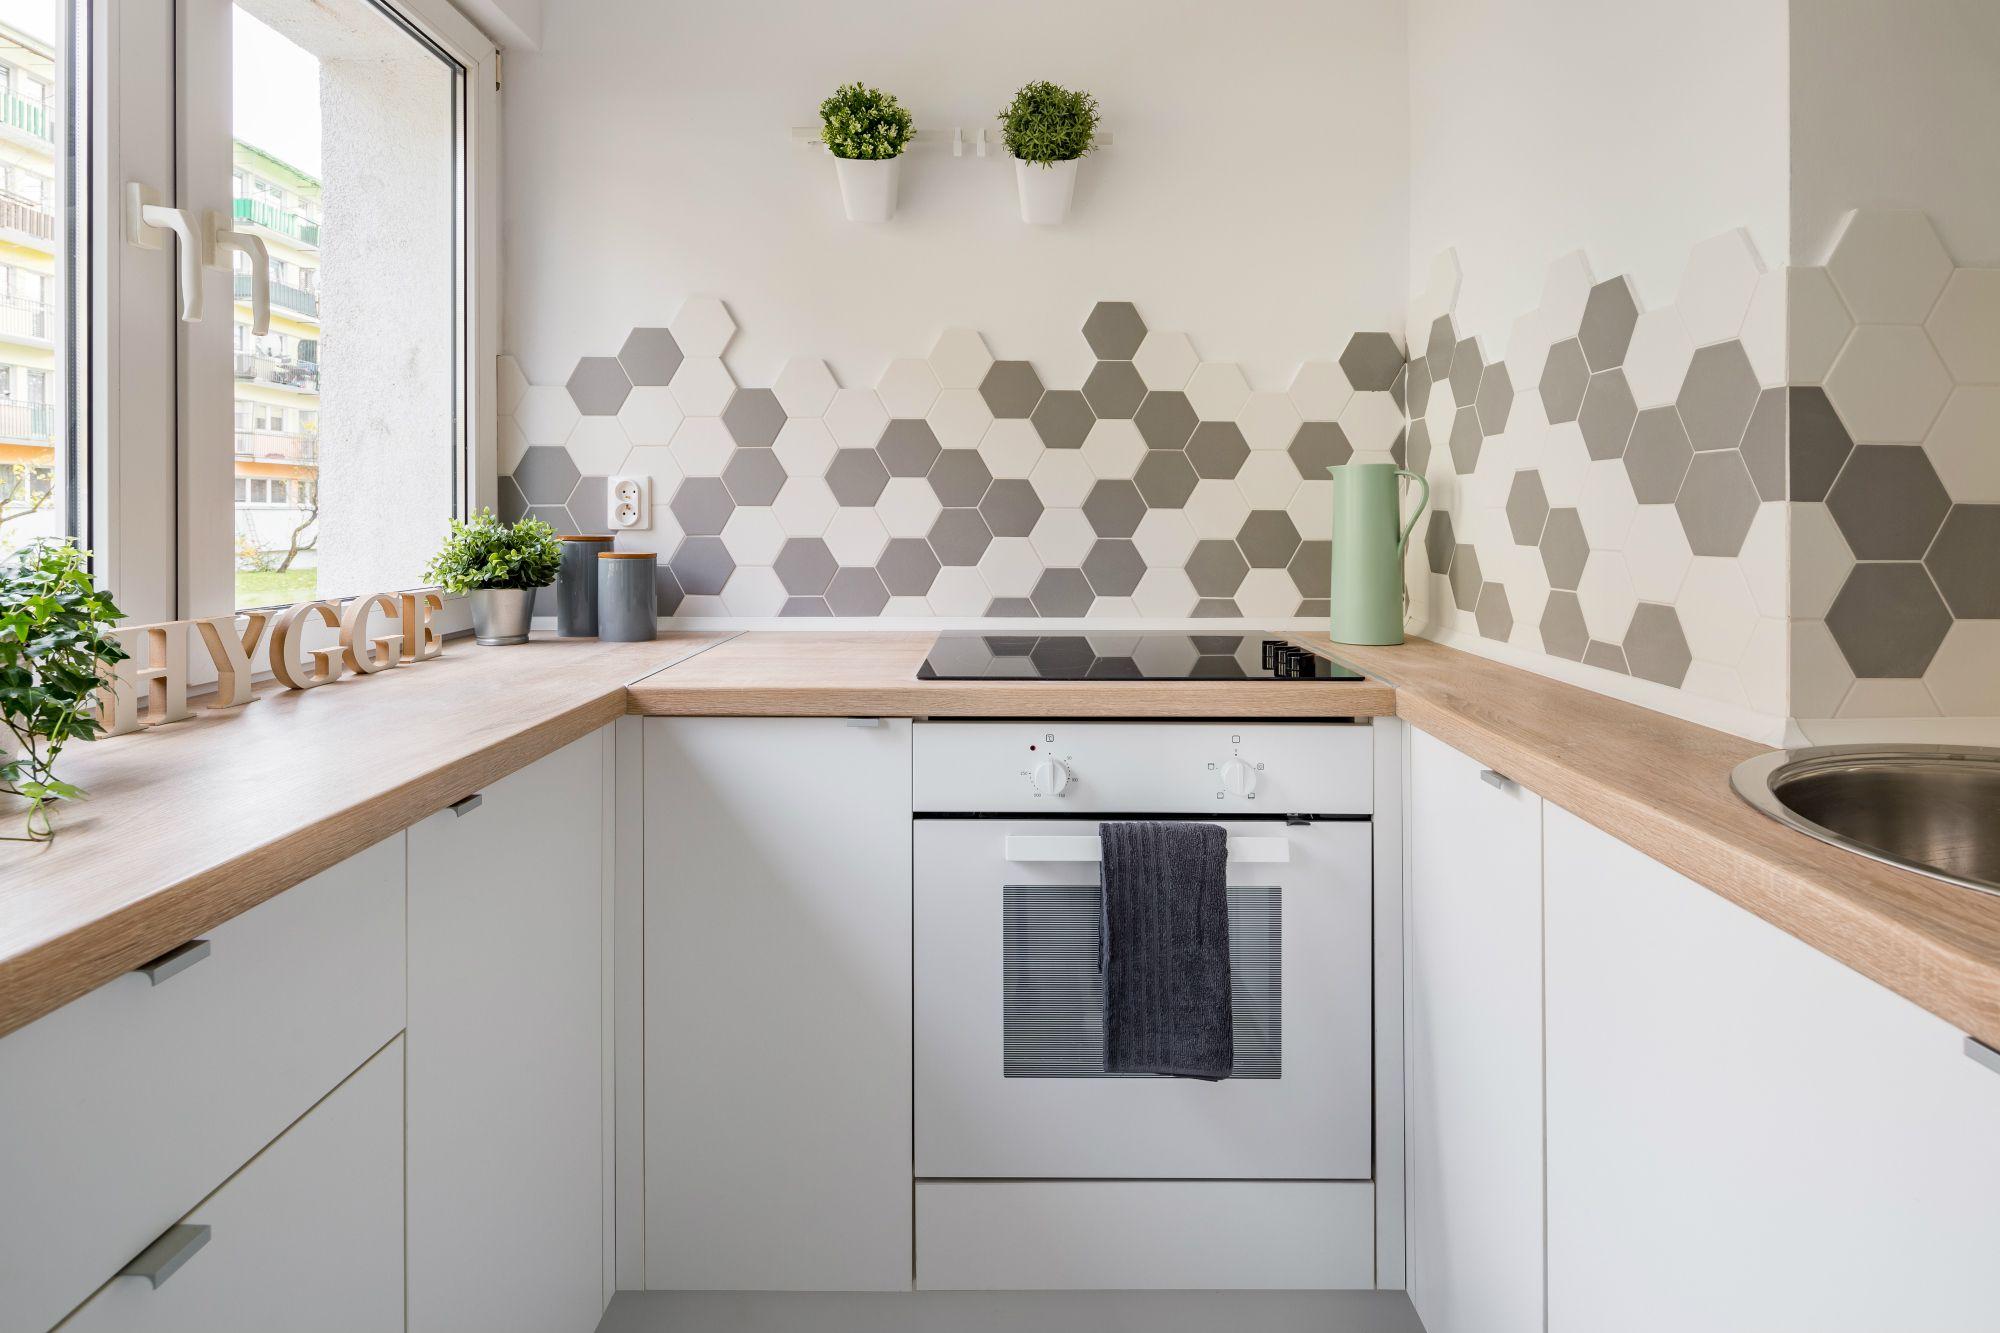 16 beautiful bathrooms with subway tile 20 surprising kitchen backsplashes that arent subway tile dailygadgetfo Choice Image